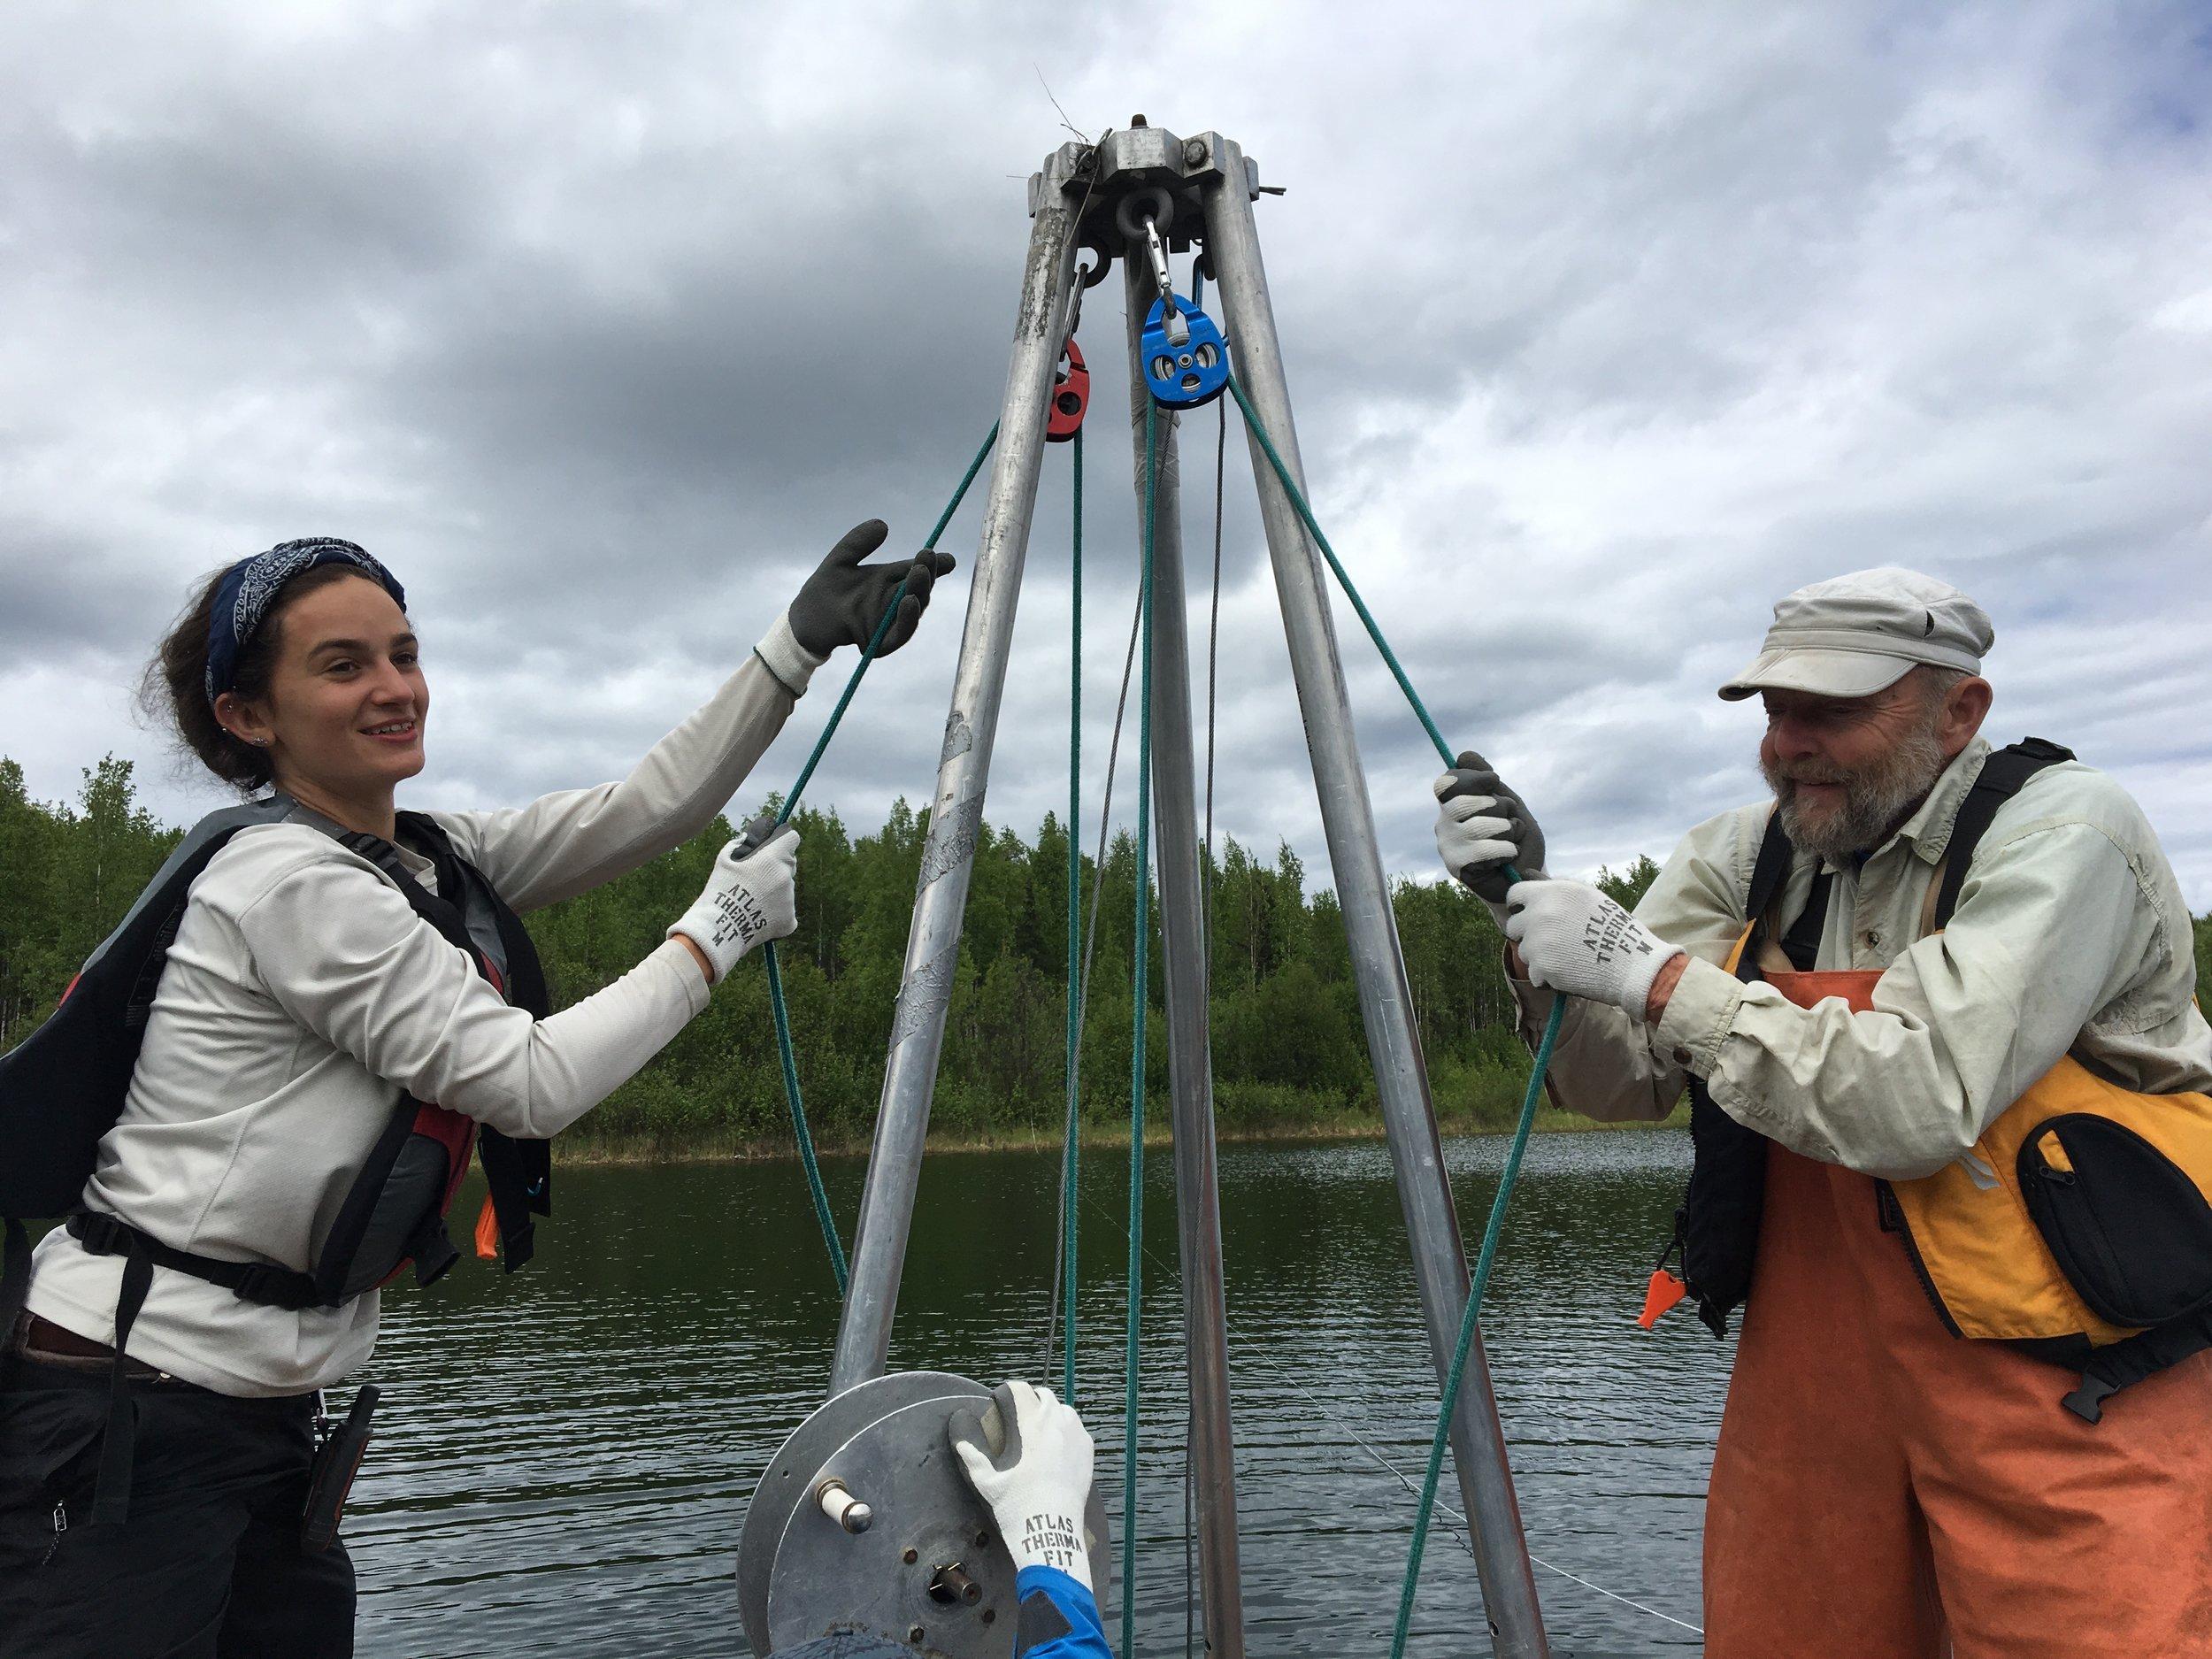 Ellie Broadman and Ed Berg percussion coring at Sunken Island Land